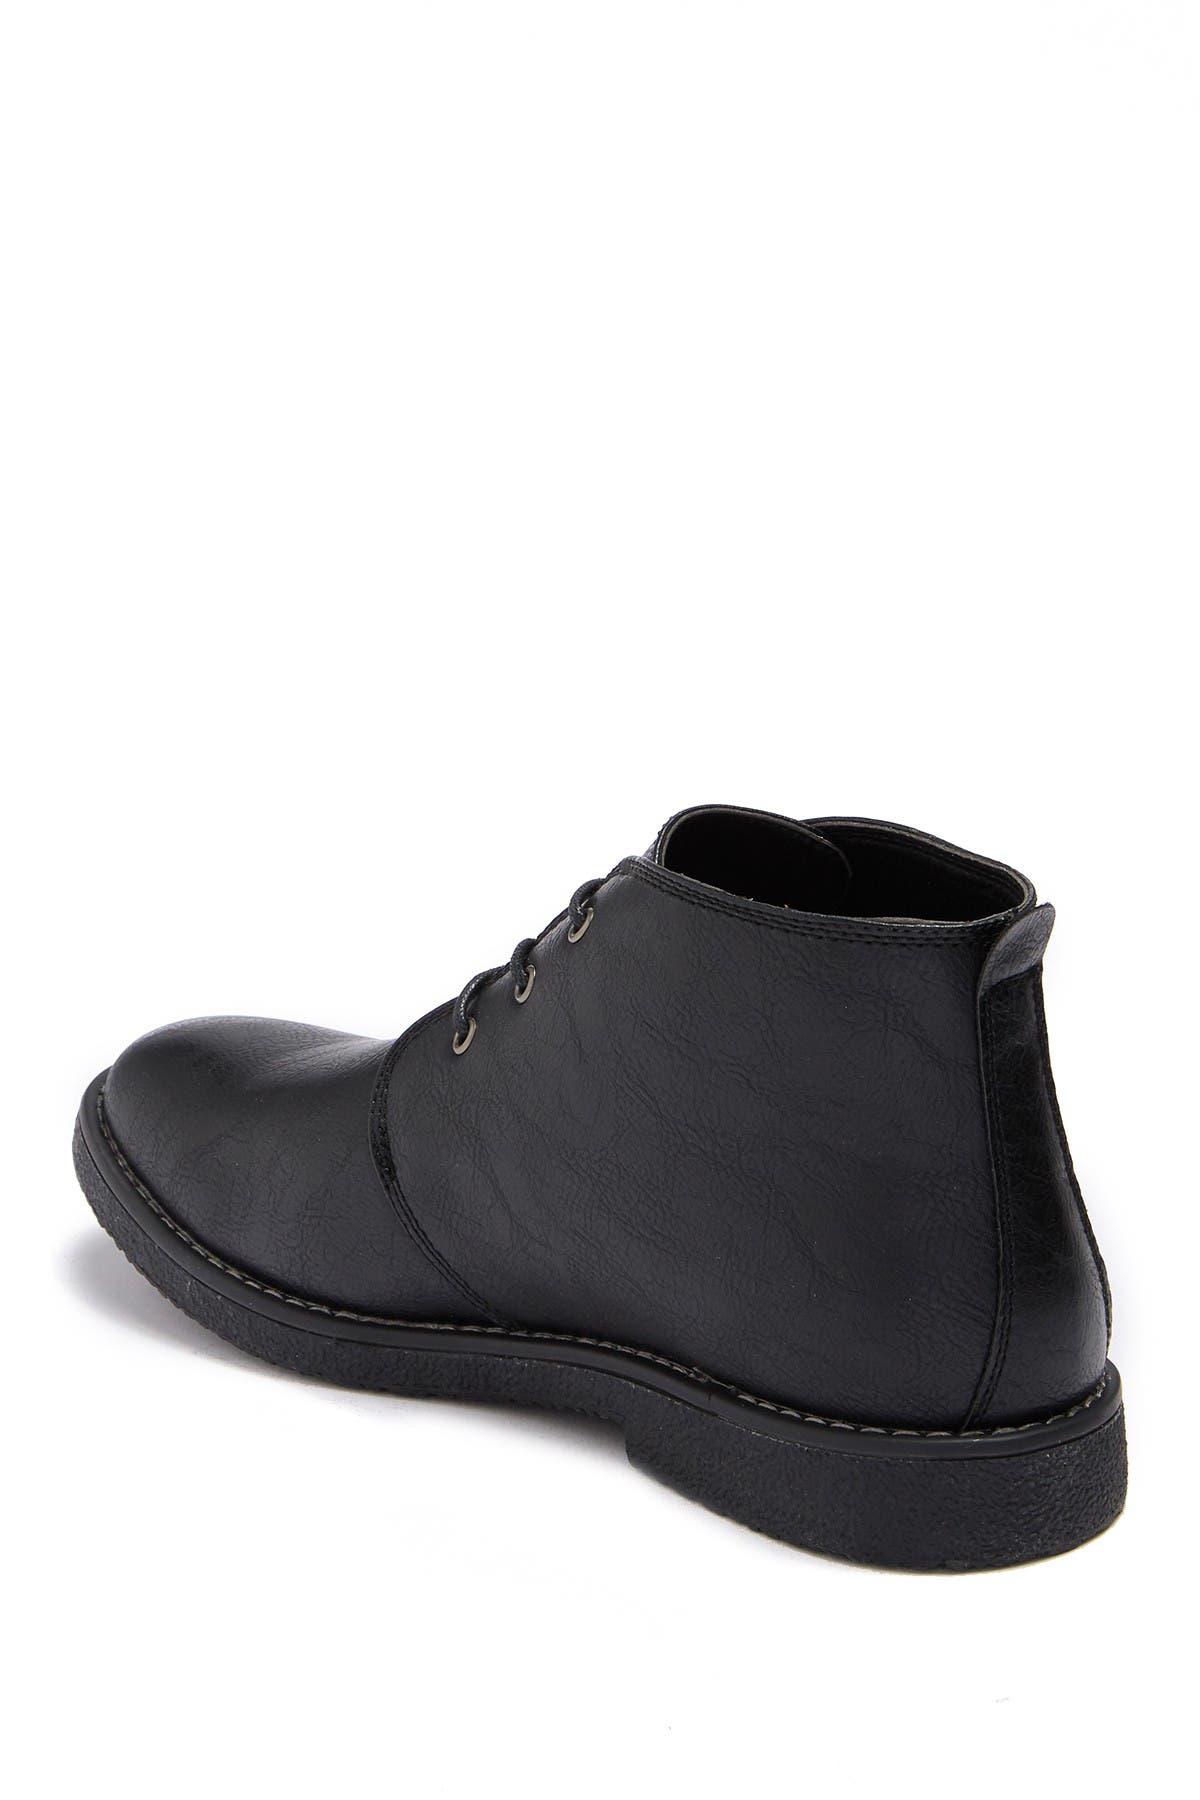 Hawke & Co. Gable Chukka Boot